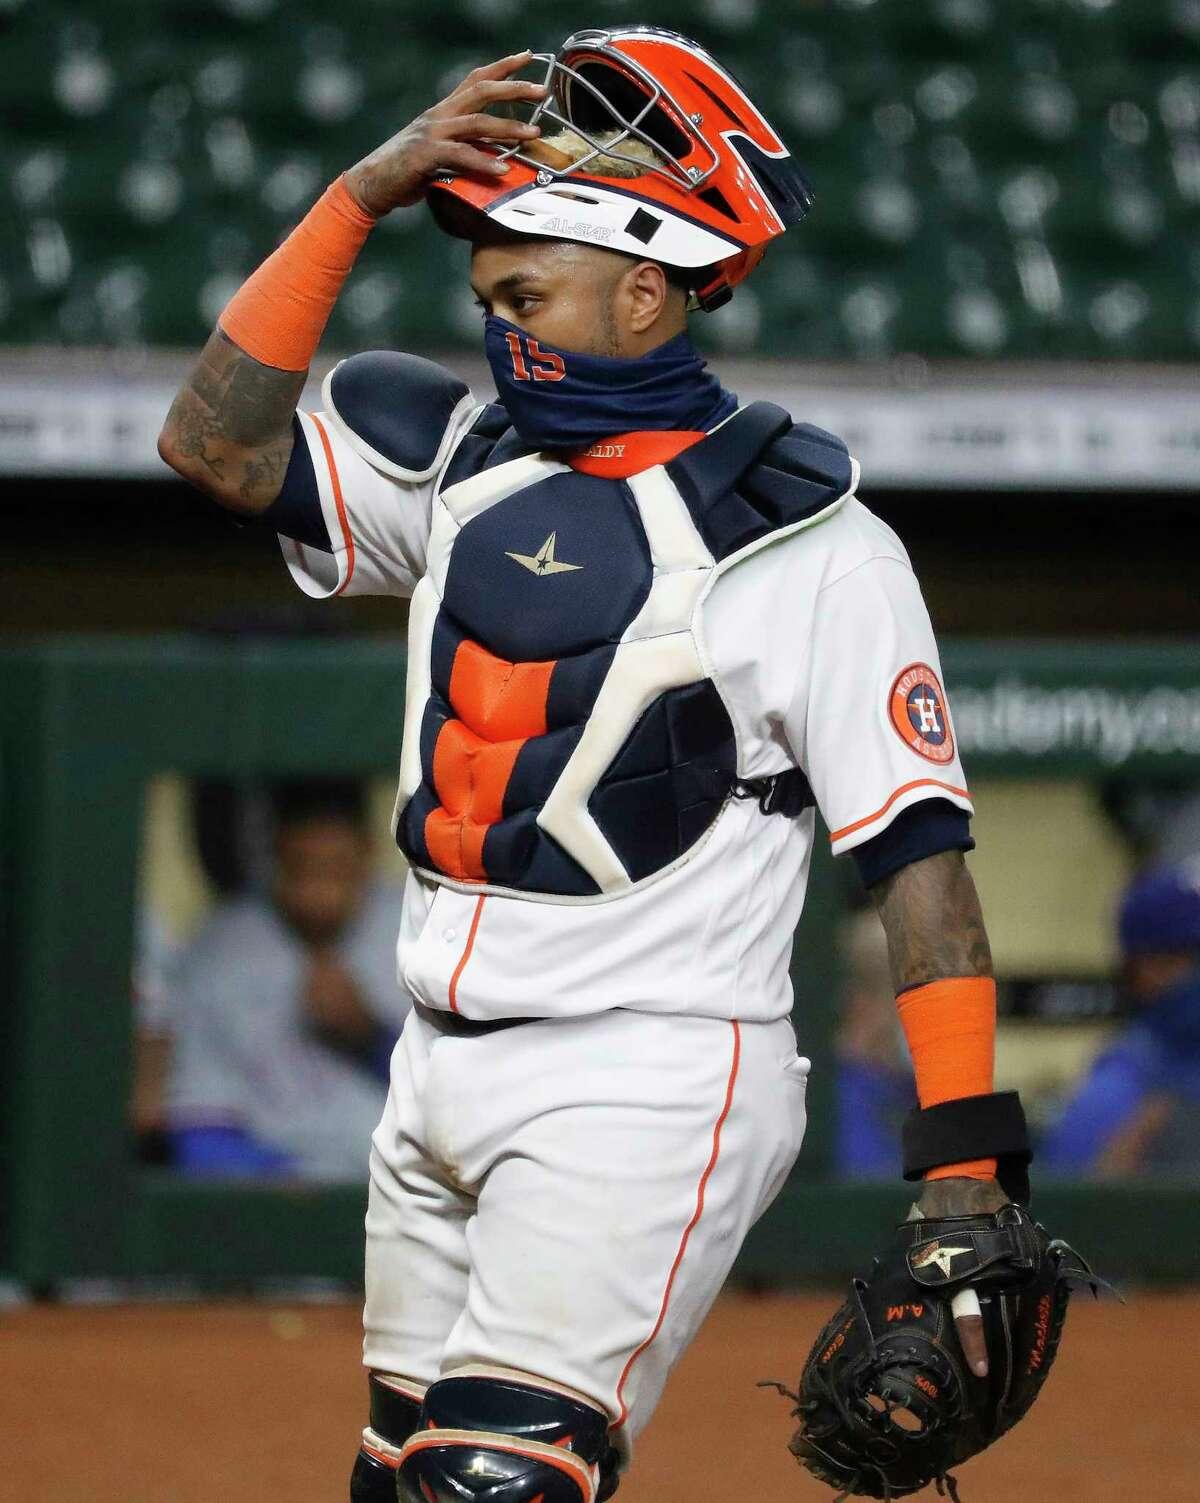 Houston Astros catcher Martin Maldonado (15) during the ninth inning of an MLB baseball game at Minute Maid Park, Wednesday, September 2, 2020, in Houston.